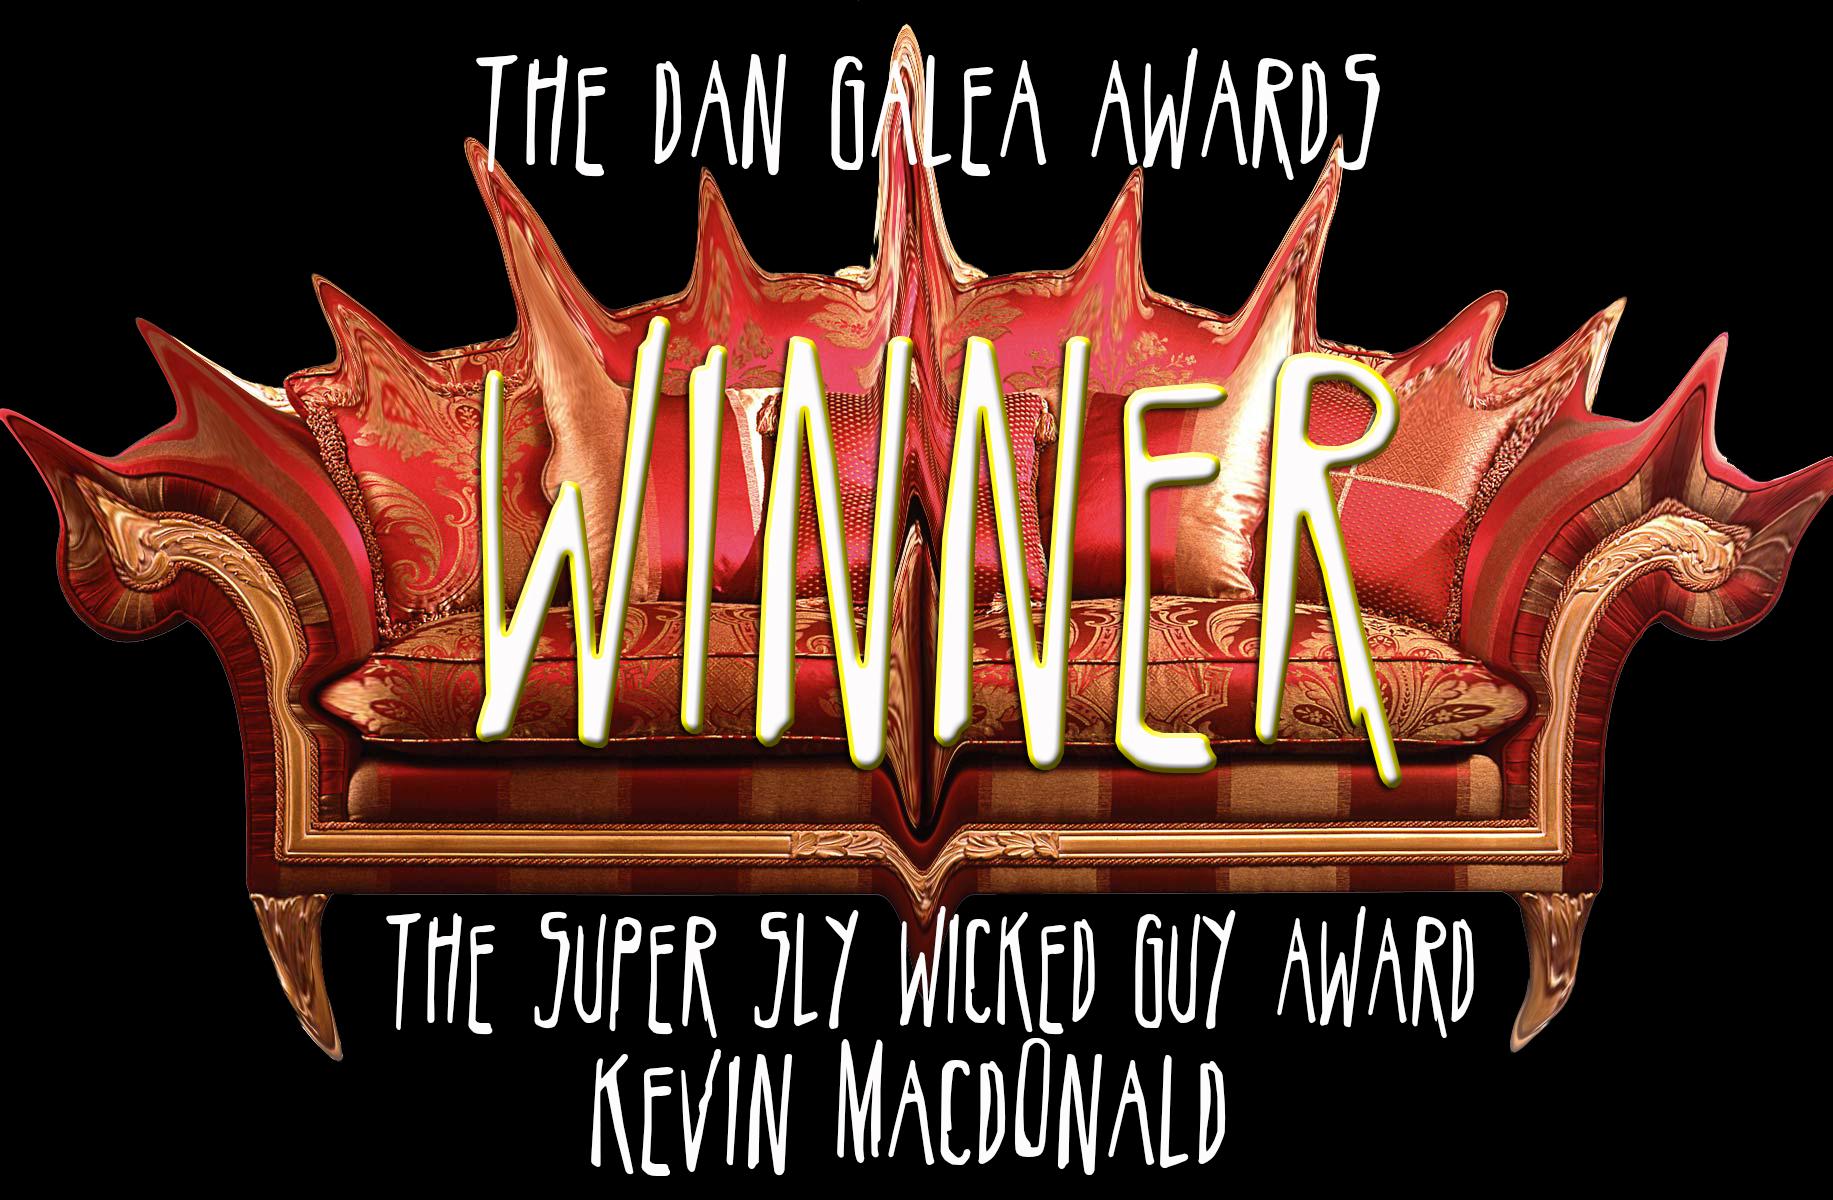 DGAWARDS Kevin Macdonald.jpg